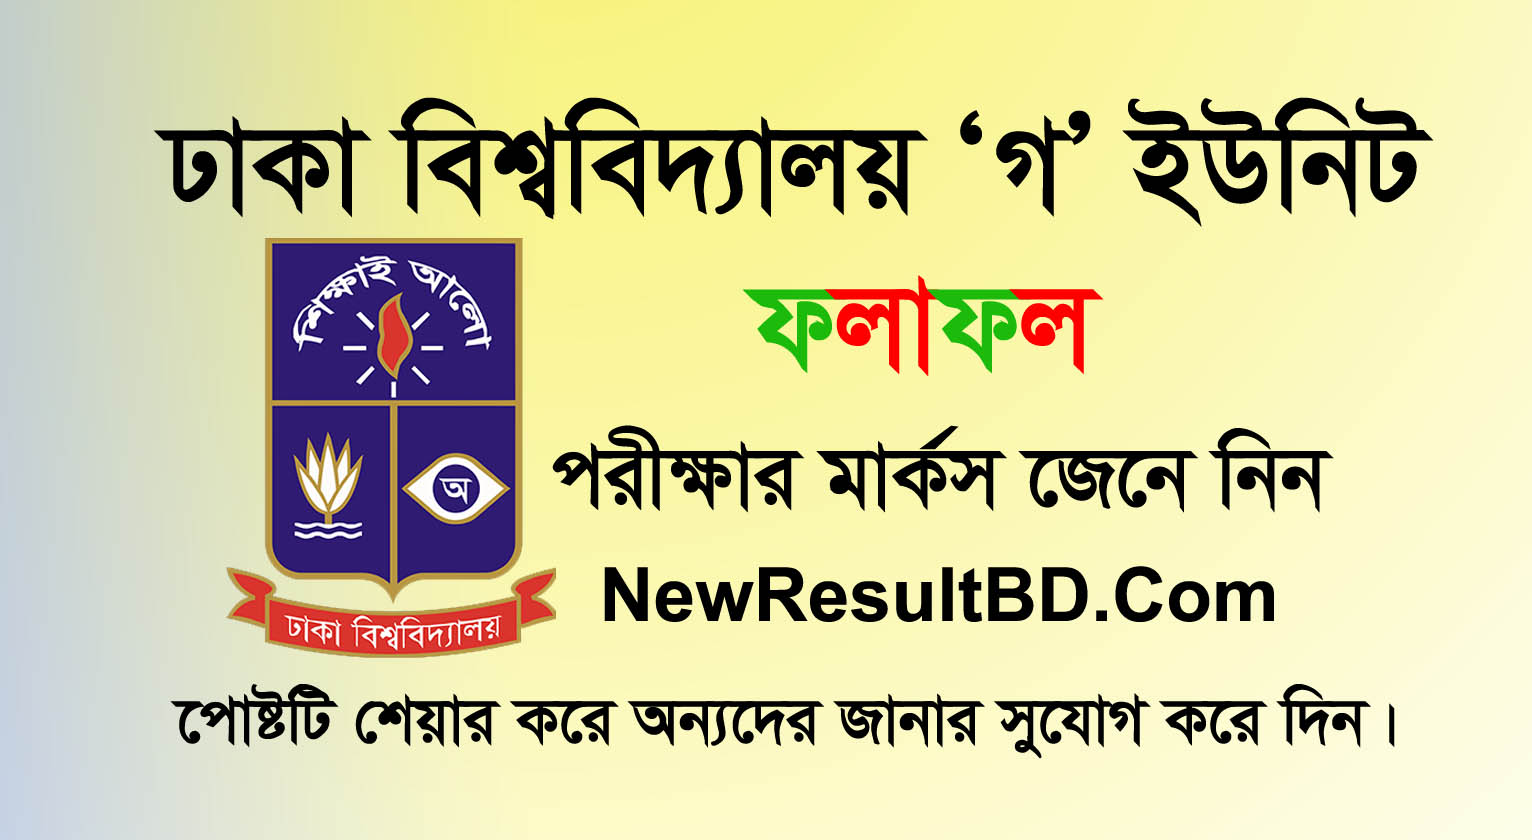 Dhaka University C Unit Exam Result 2019, DU C Unit Results, GA Unit Result, ঢাকা বিশ্ববিদ্যালয় গ ইউনিট রেজাল্ট ২০১৯, admission.eis.du.ac.bd result C unit.